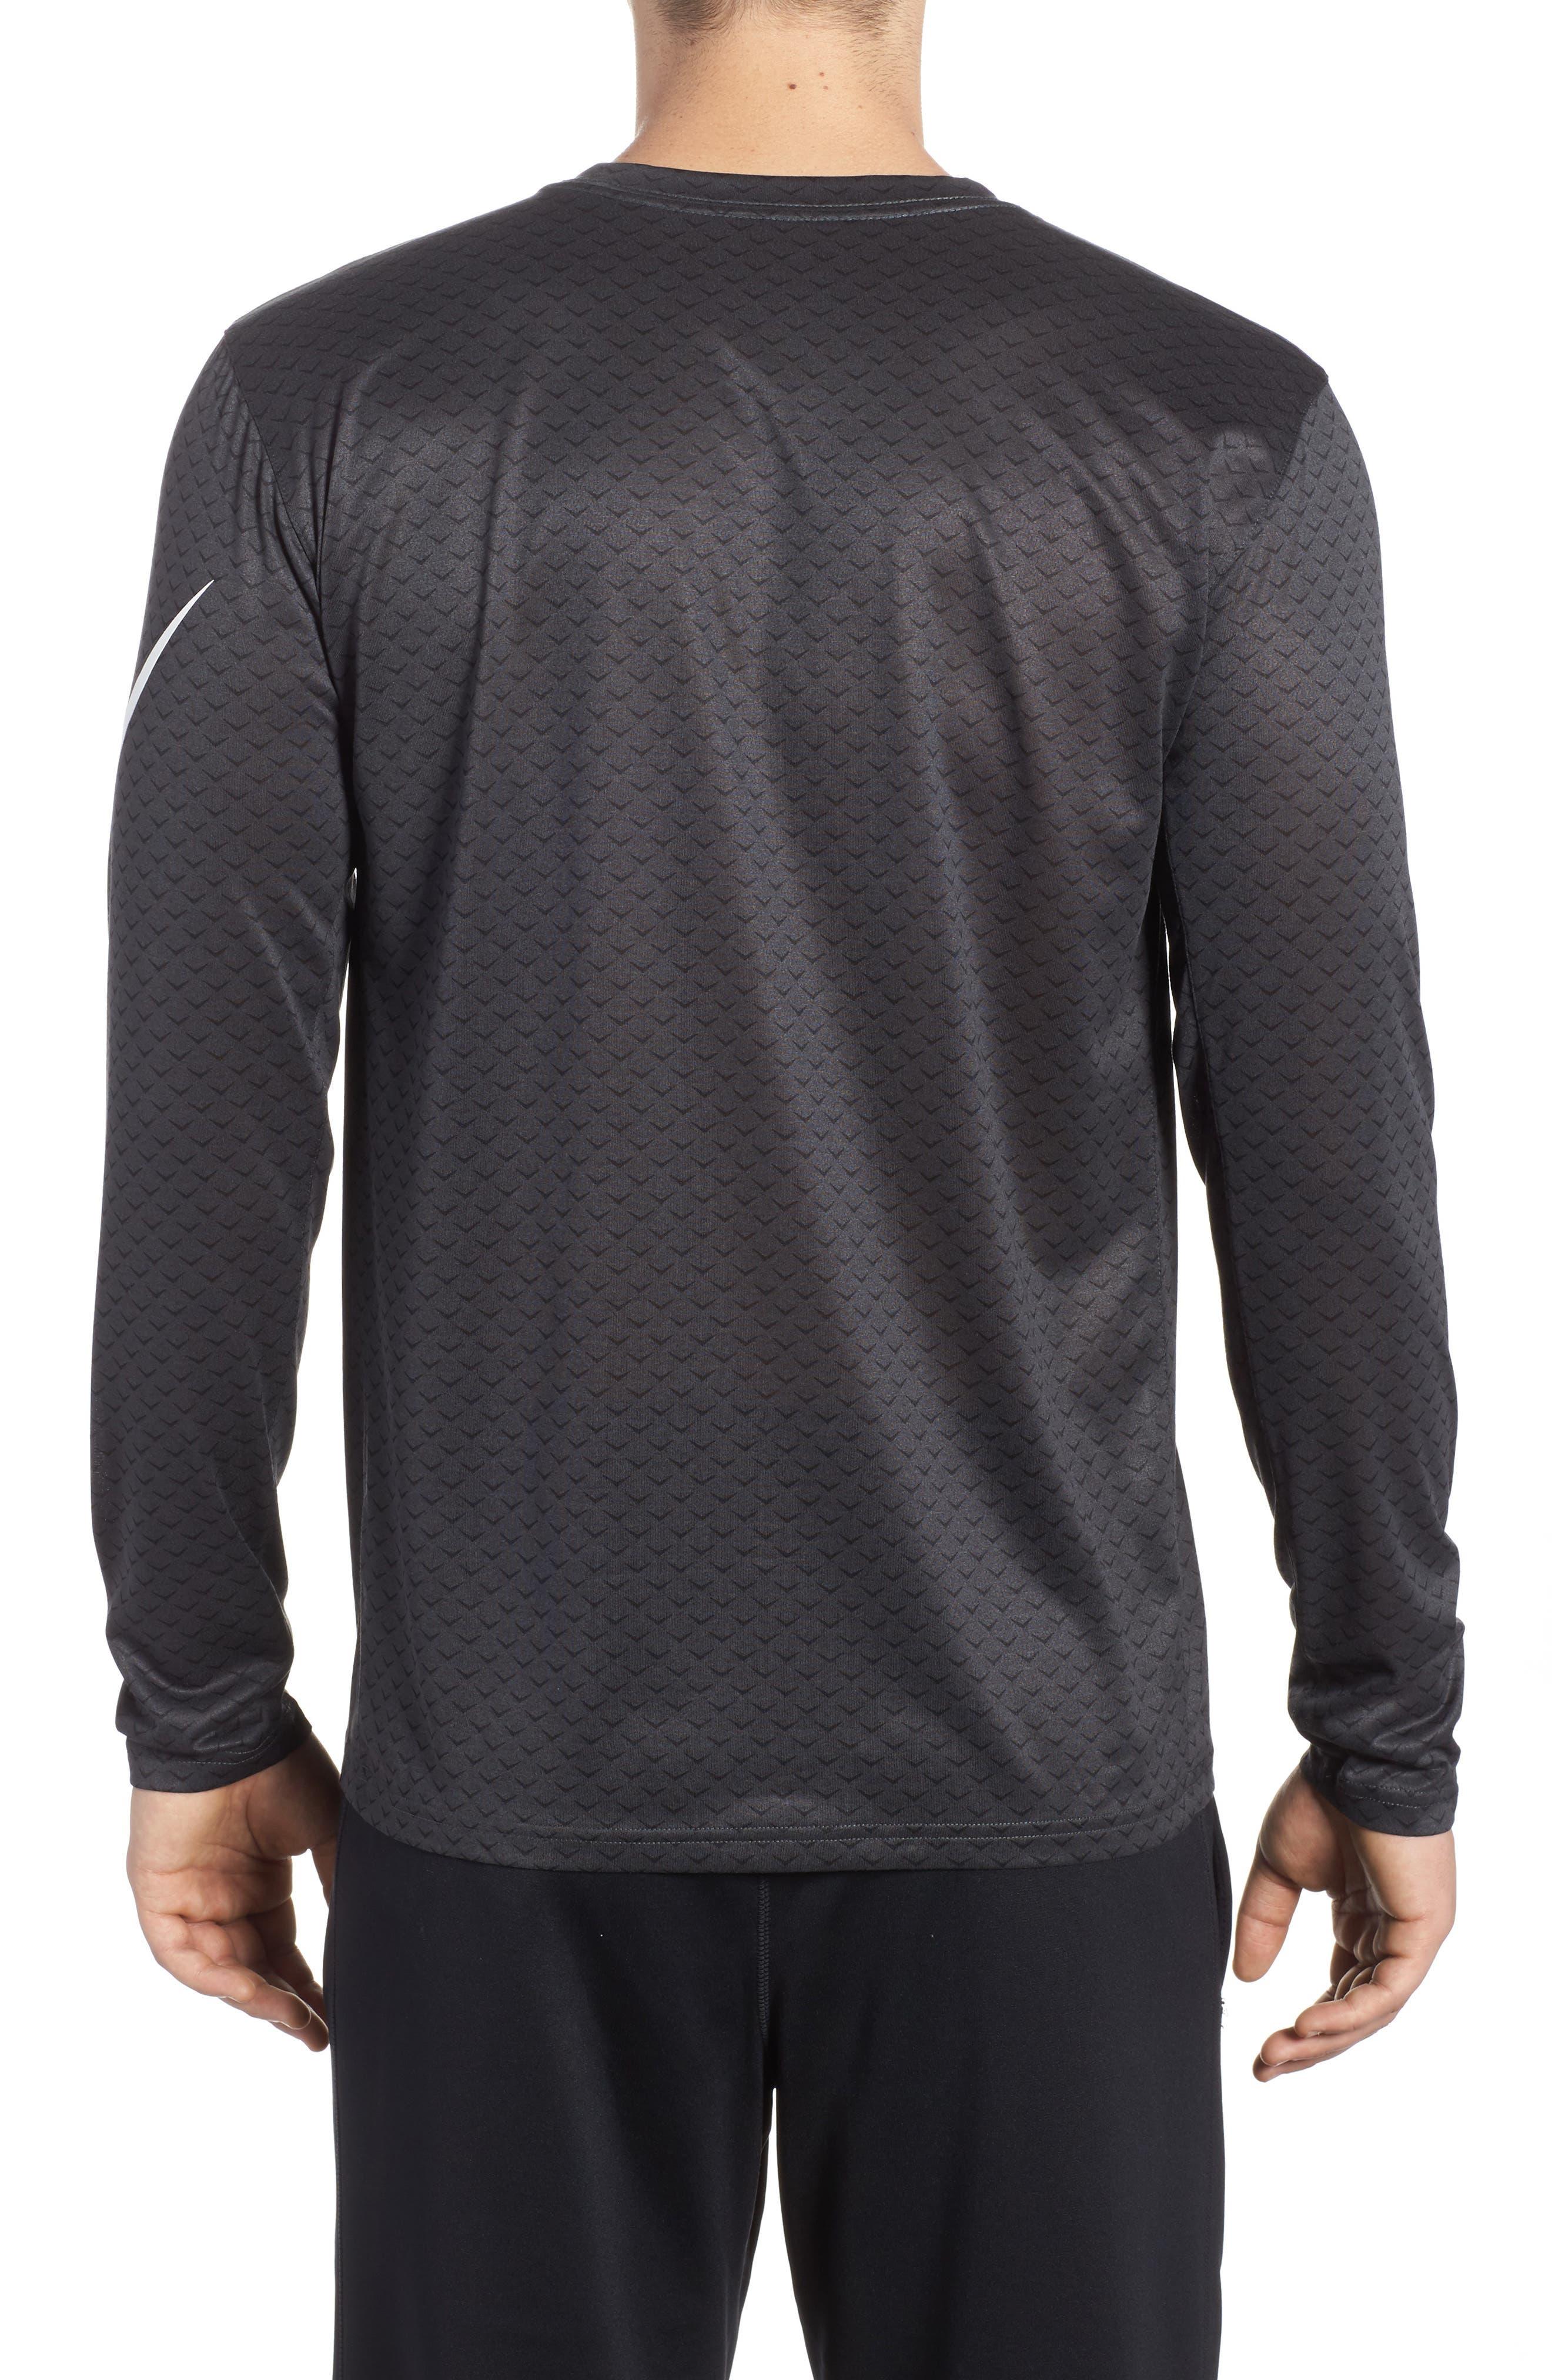 Dry Legend Training T-Shirt,                             Alternate thumbnail 2, color,                             Anthracite/ White